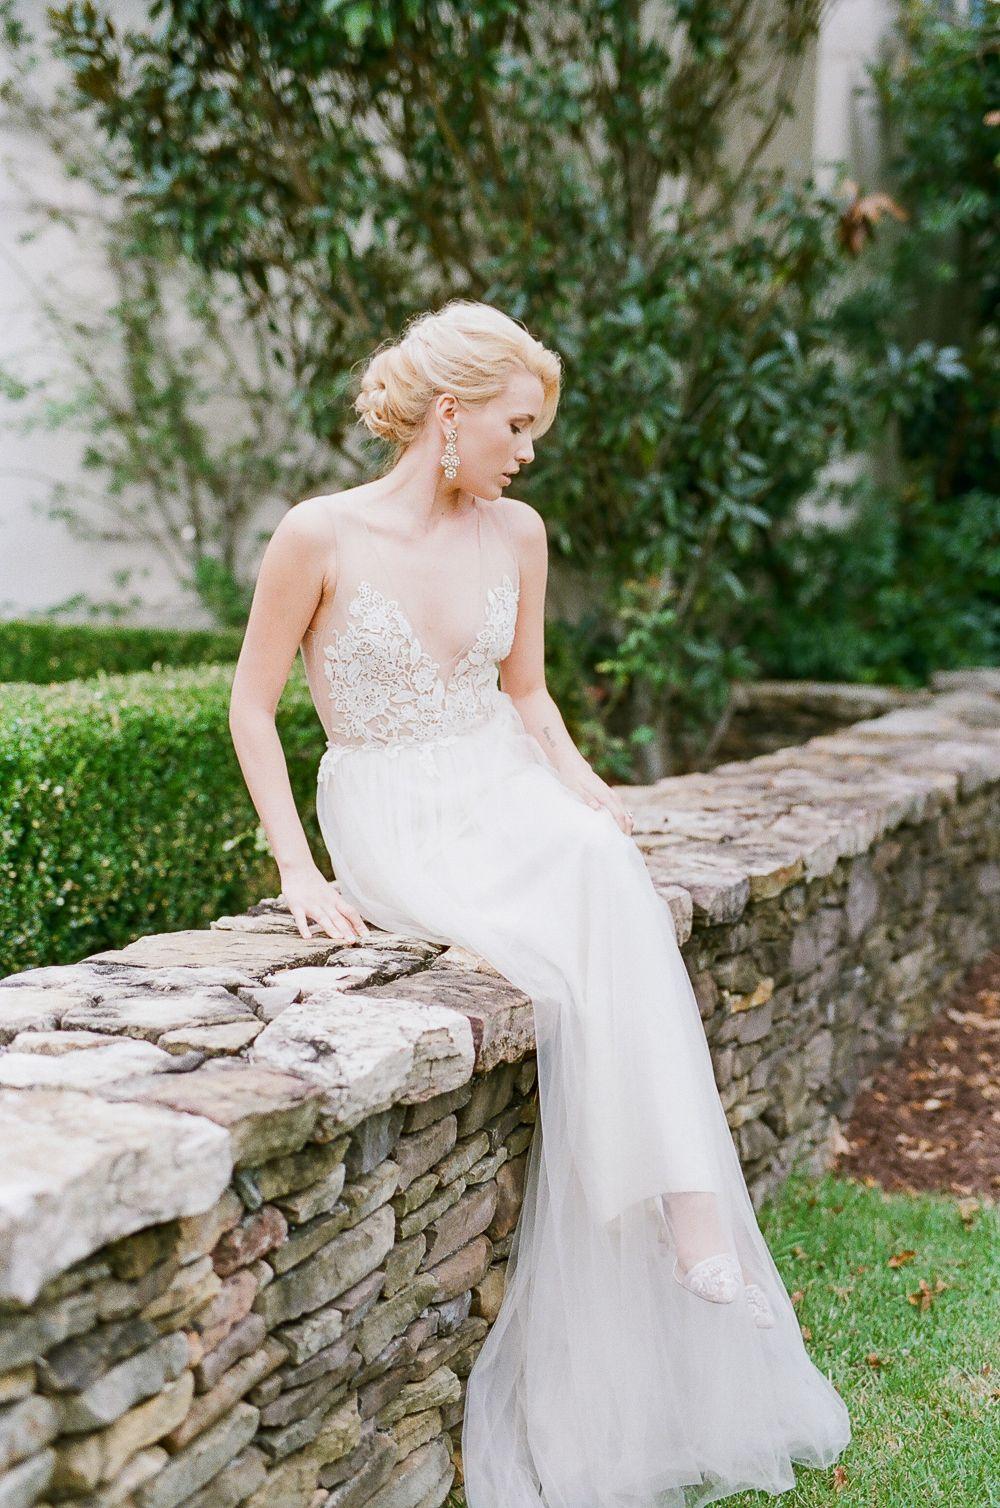 Wedding dresses for older ladies  Romantic Fall Garden Inspiration  Best Wedding Blog  Wedding Gowns